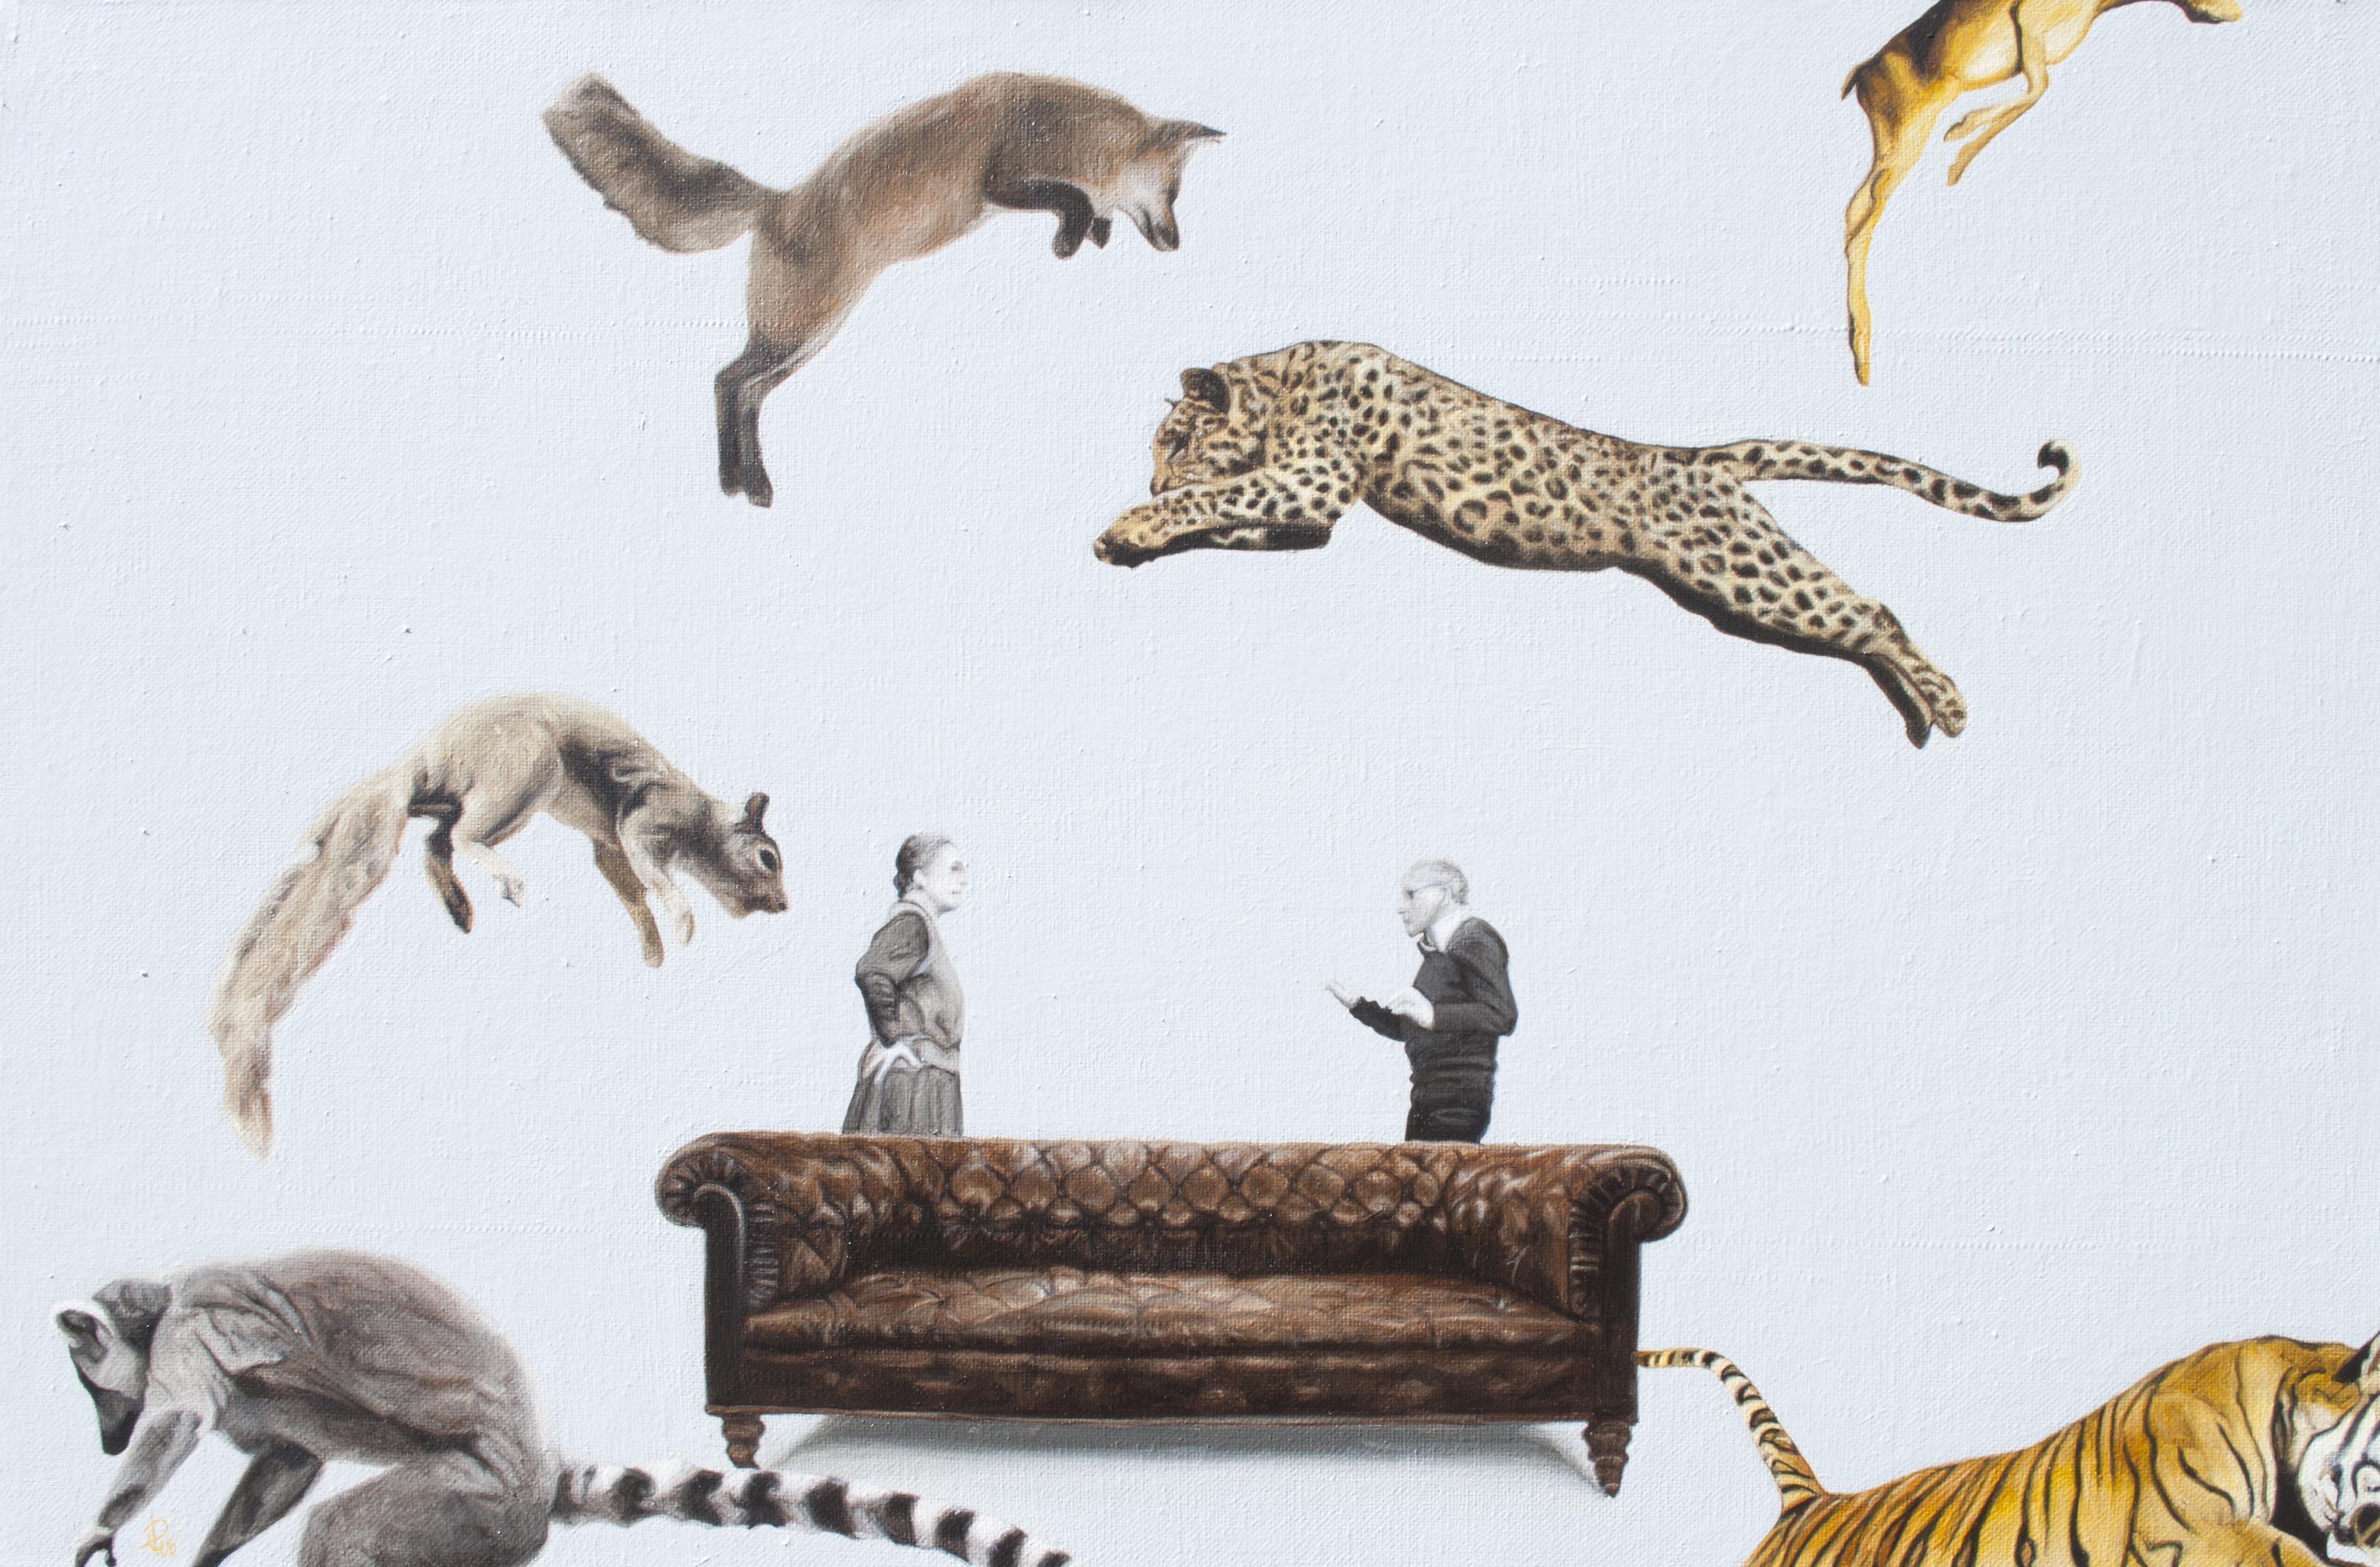 Detrás de ellos, óleo sobre tela, 70 x 50 cms, 2013